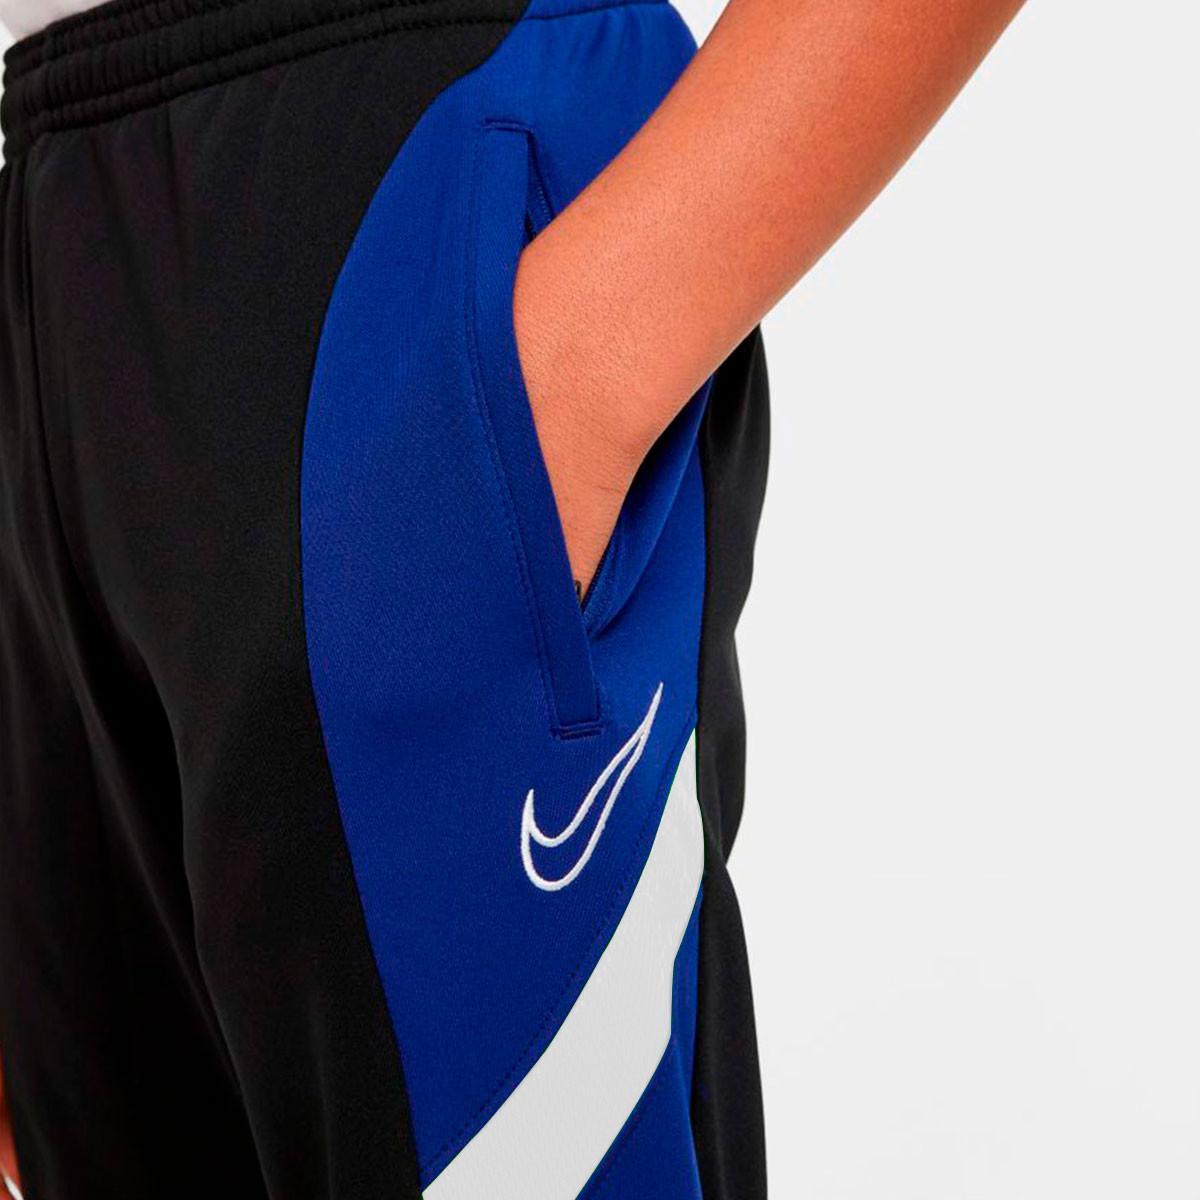 semestre Universal Robusto  Long pants Nike Dri-Fit Academy Track FP MX Niño Black-Deep royal  blue-White-White - Football store Fútbol Emotion